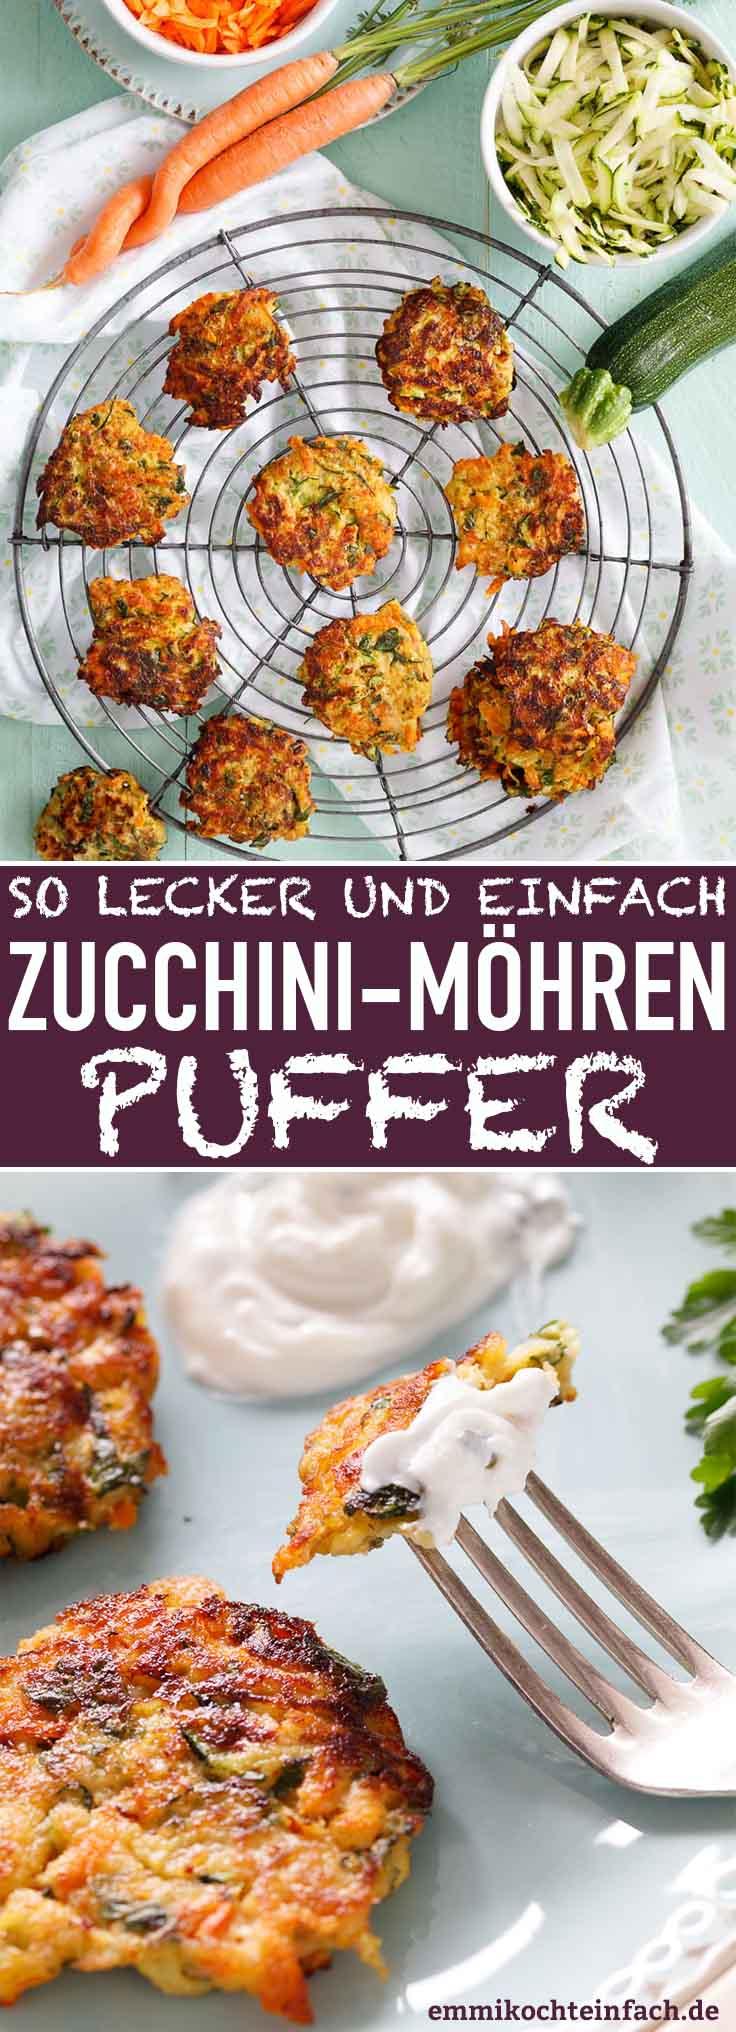 Zucchini-Möhren-Puffer - www.emmikochteinfach.de